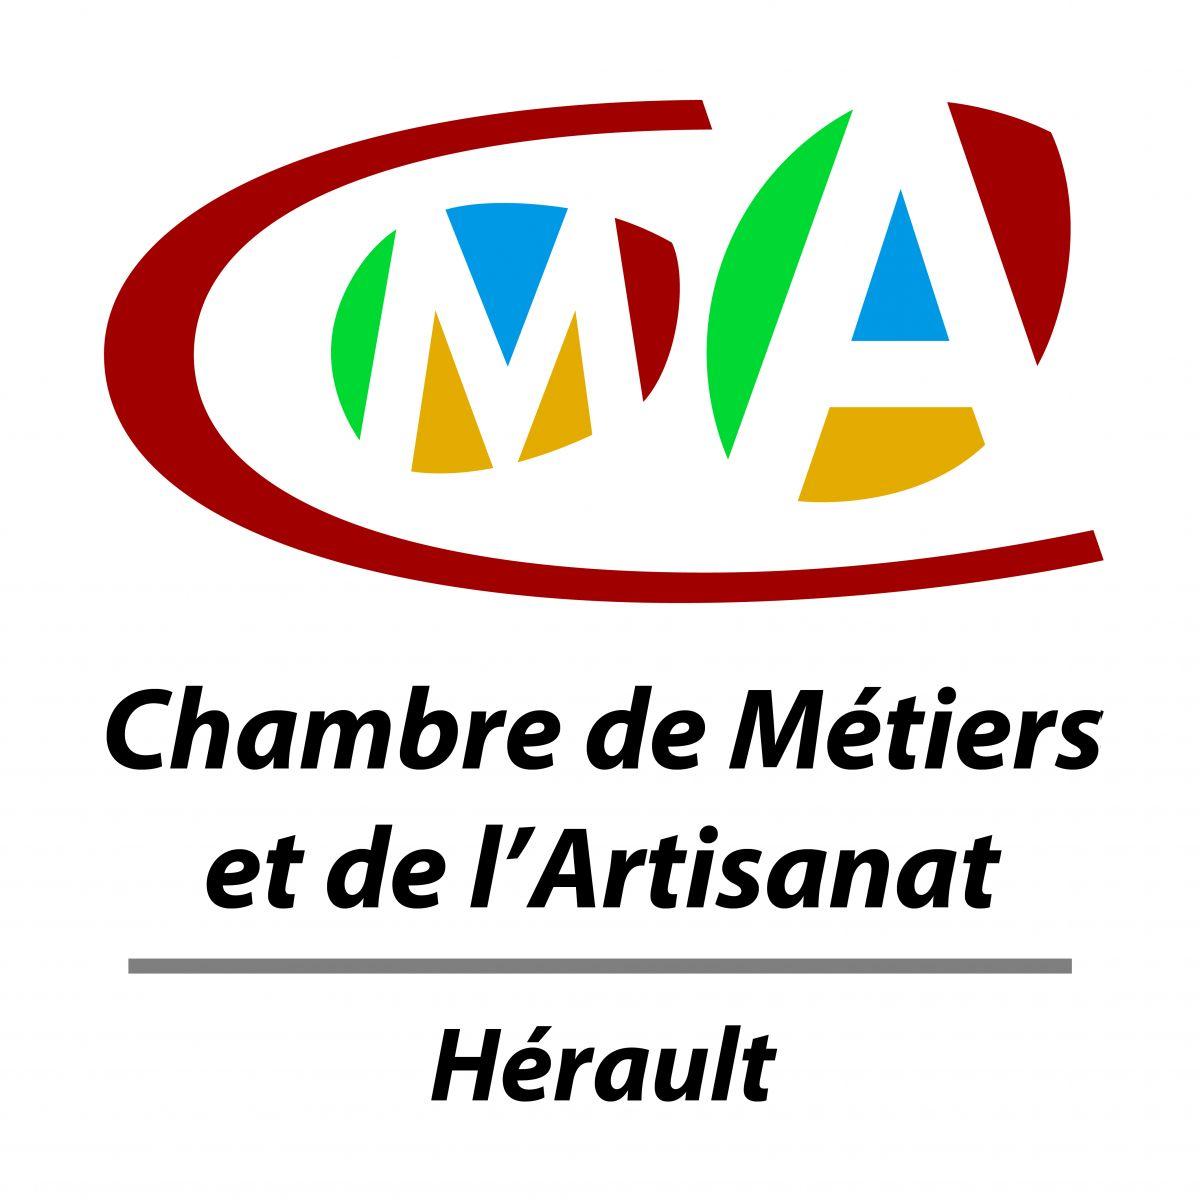 Logo CMA Hérault